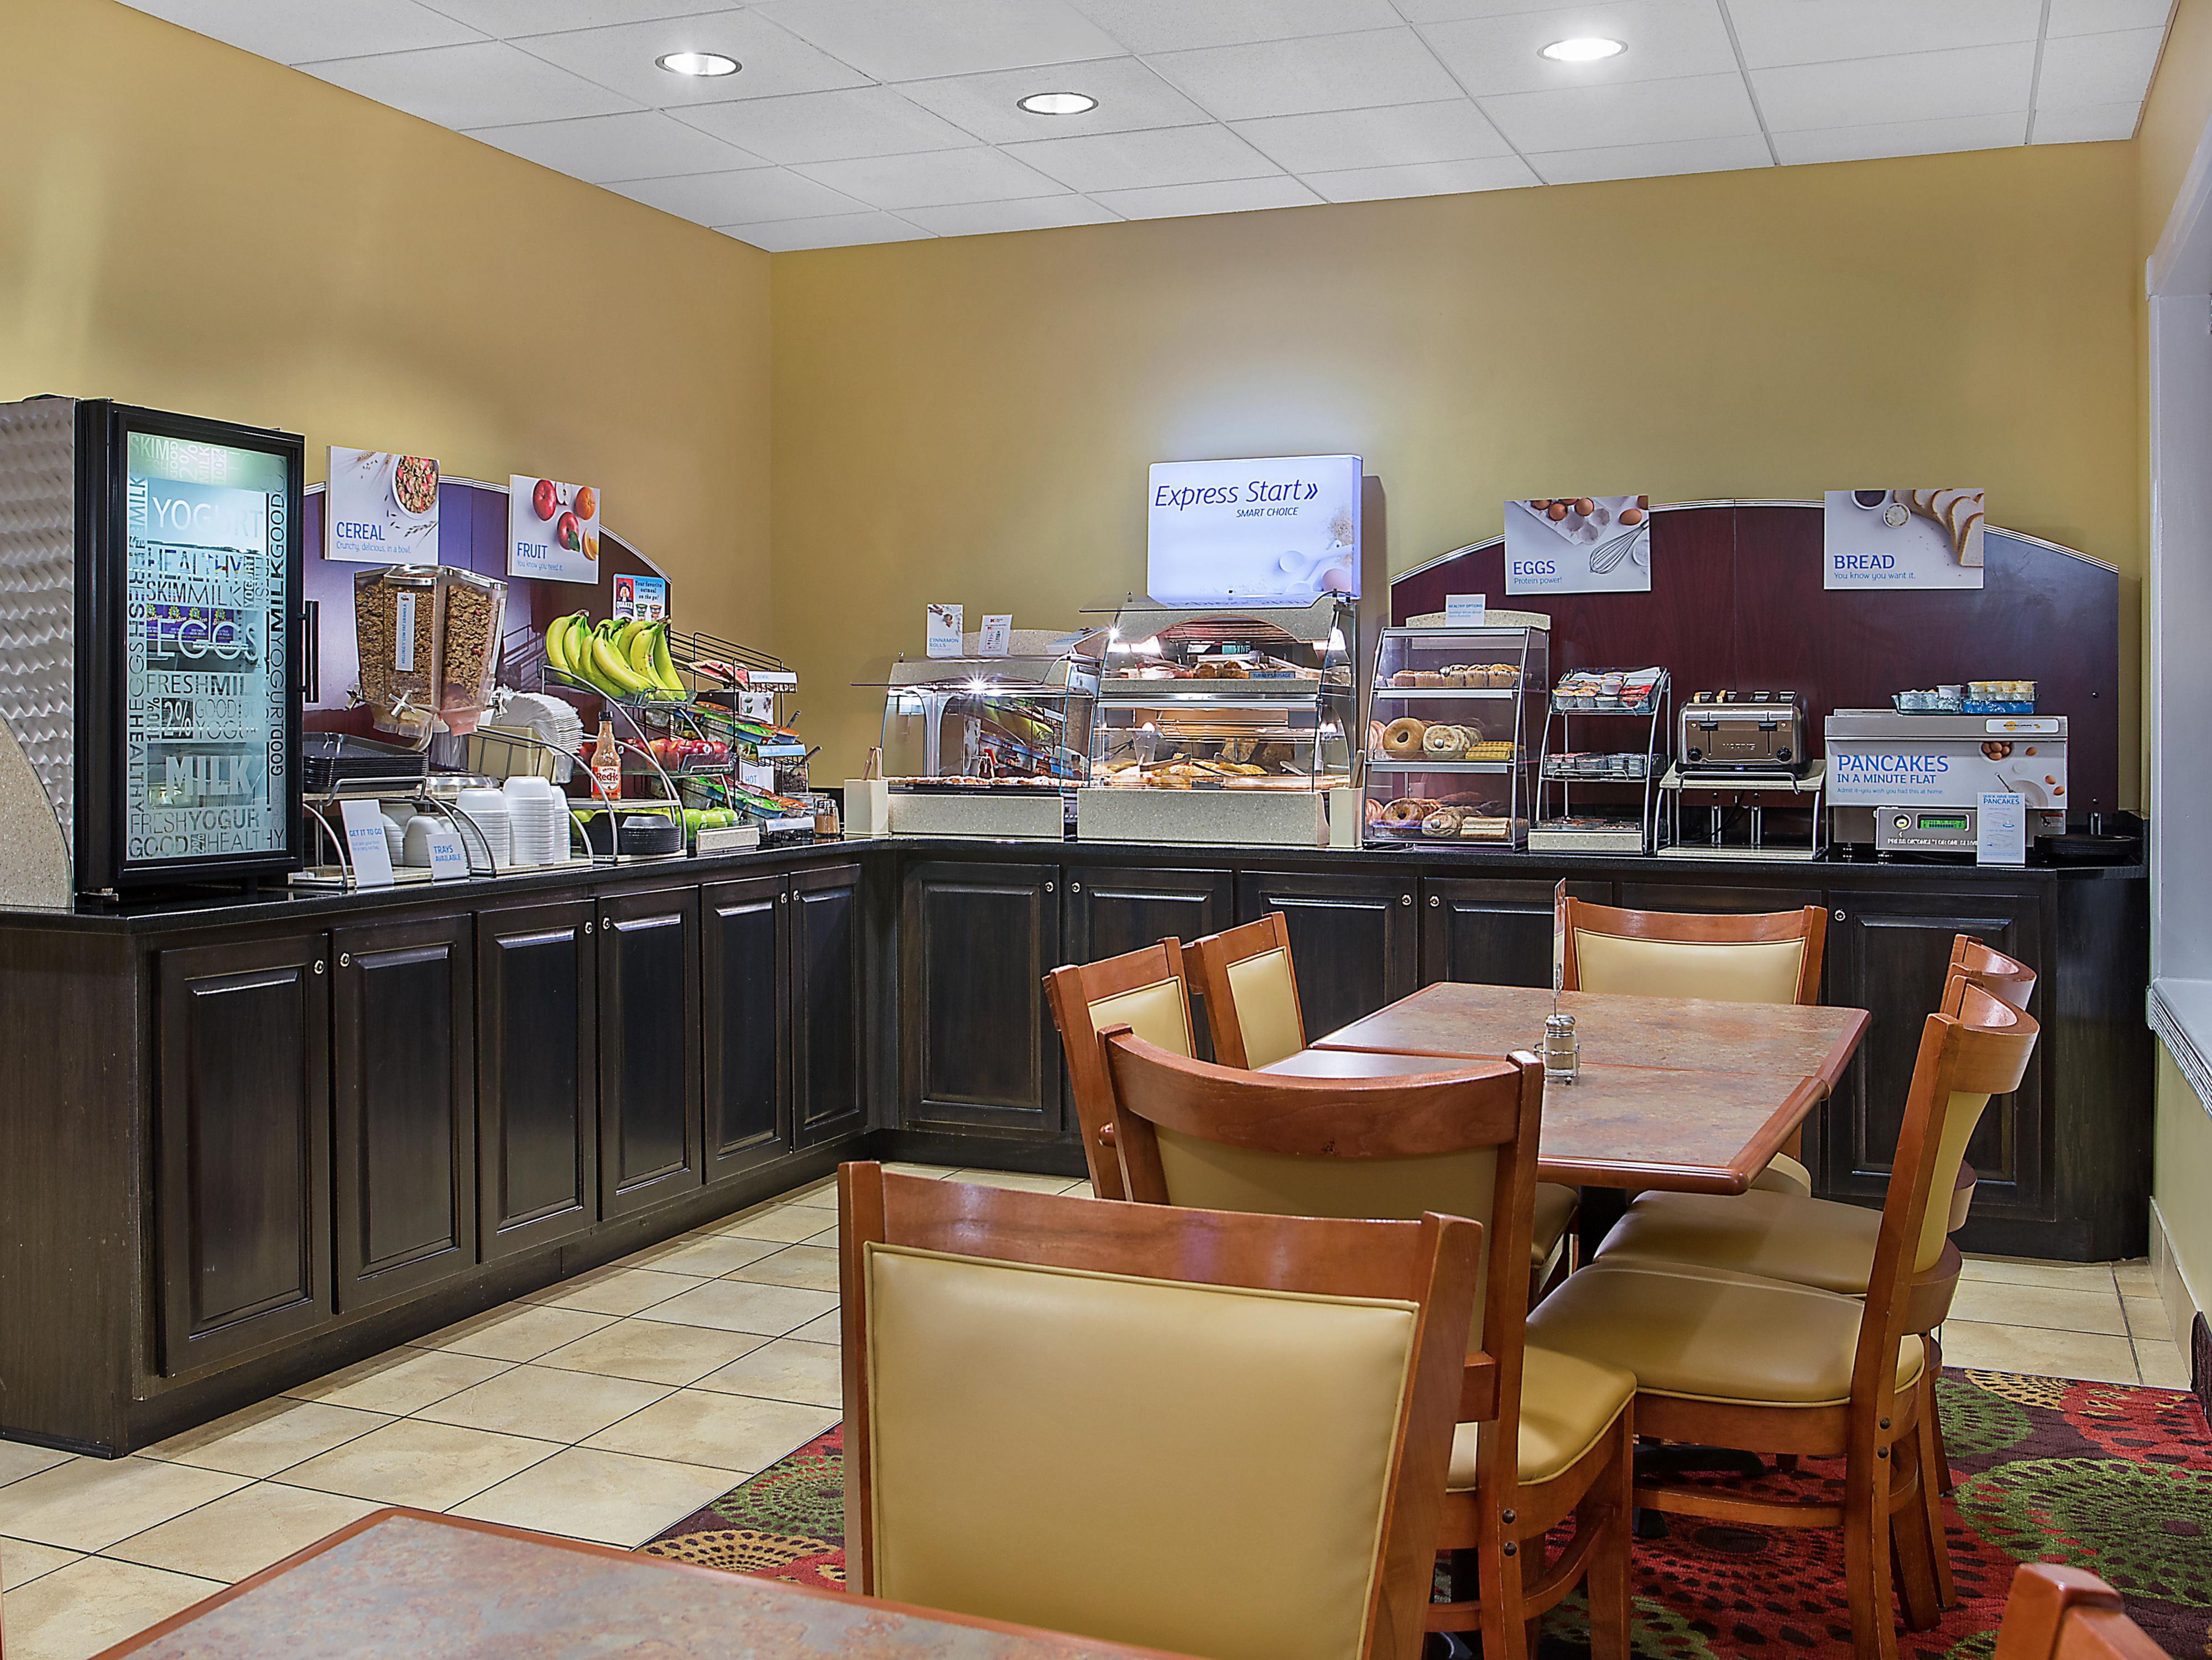 Holiday Inn Express Wickam Dining Options Fort Knox Hotel